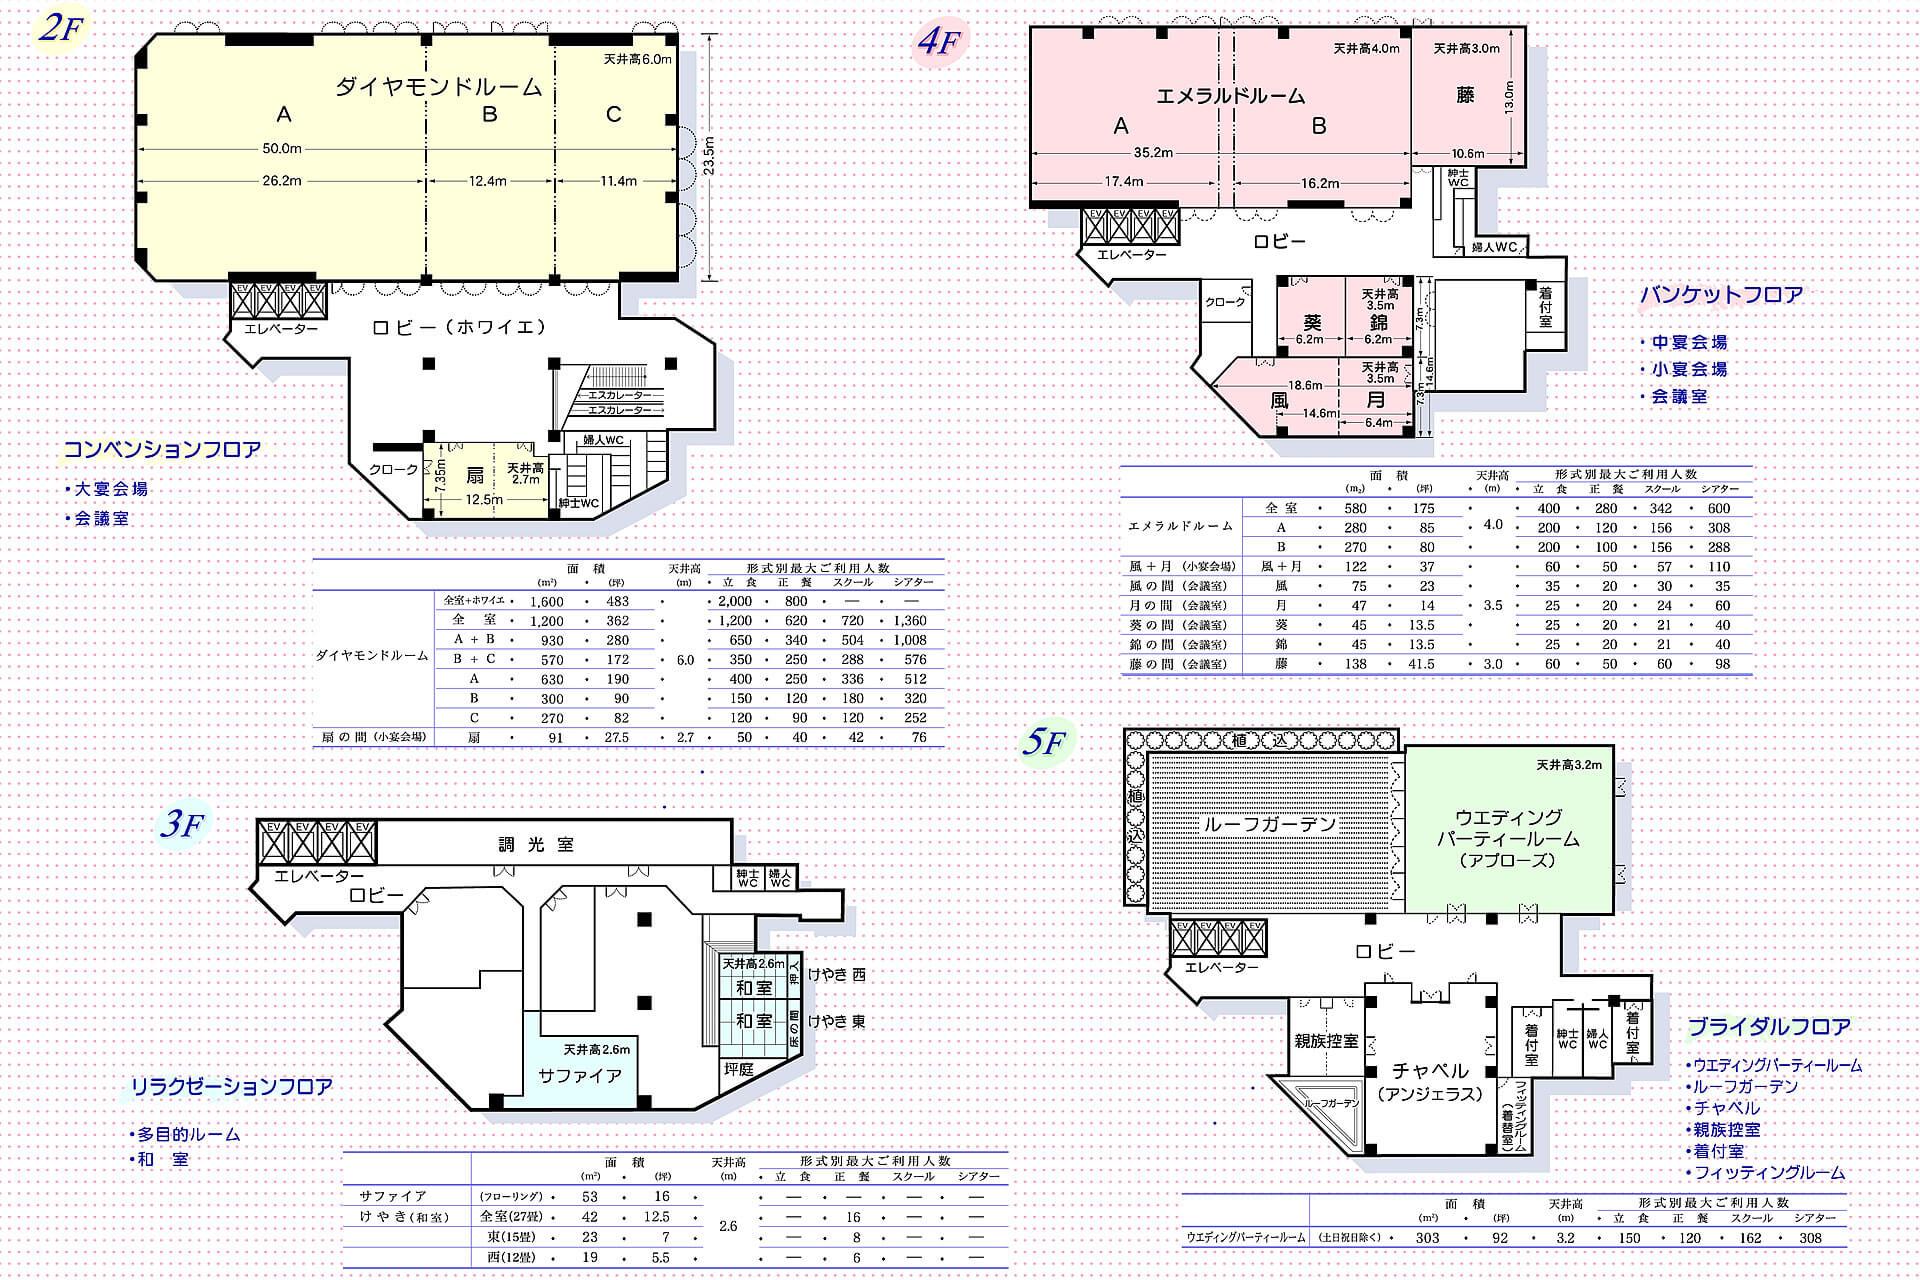 HOTEL KANAZAWA|Floor Map